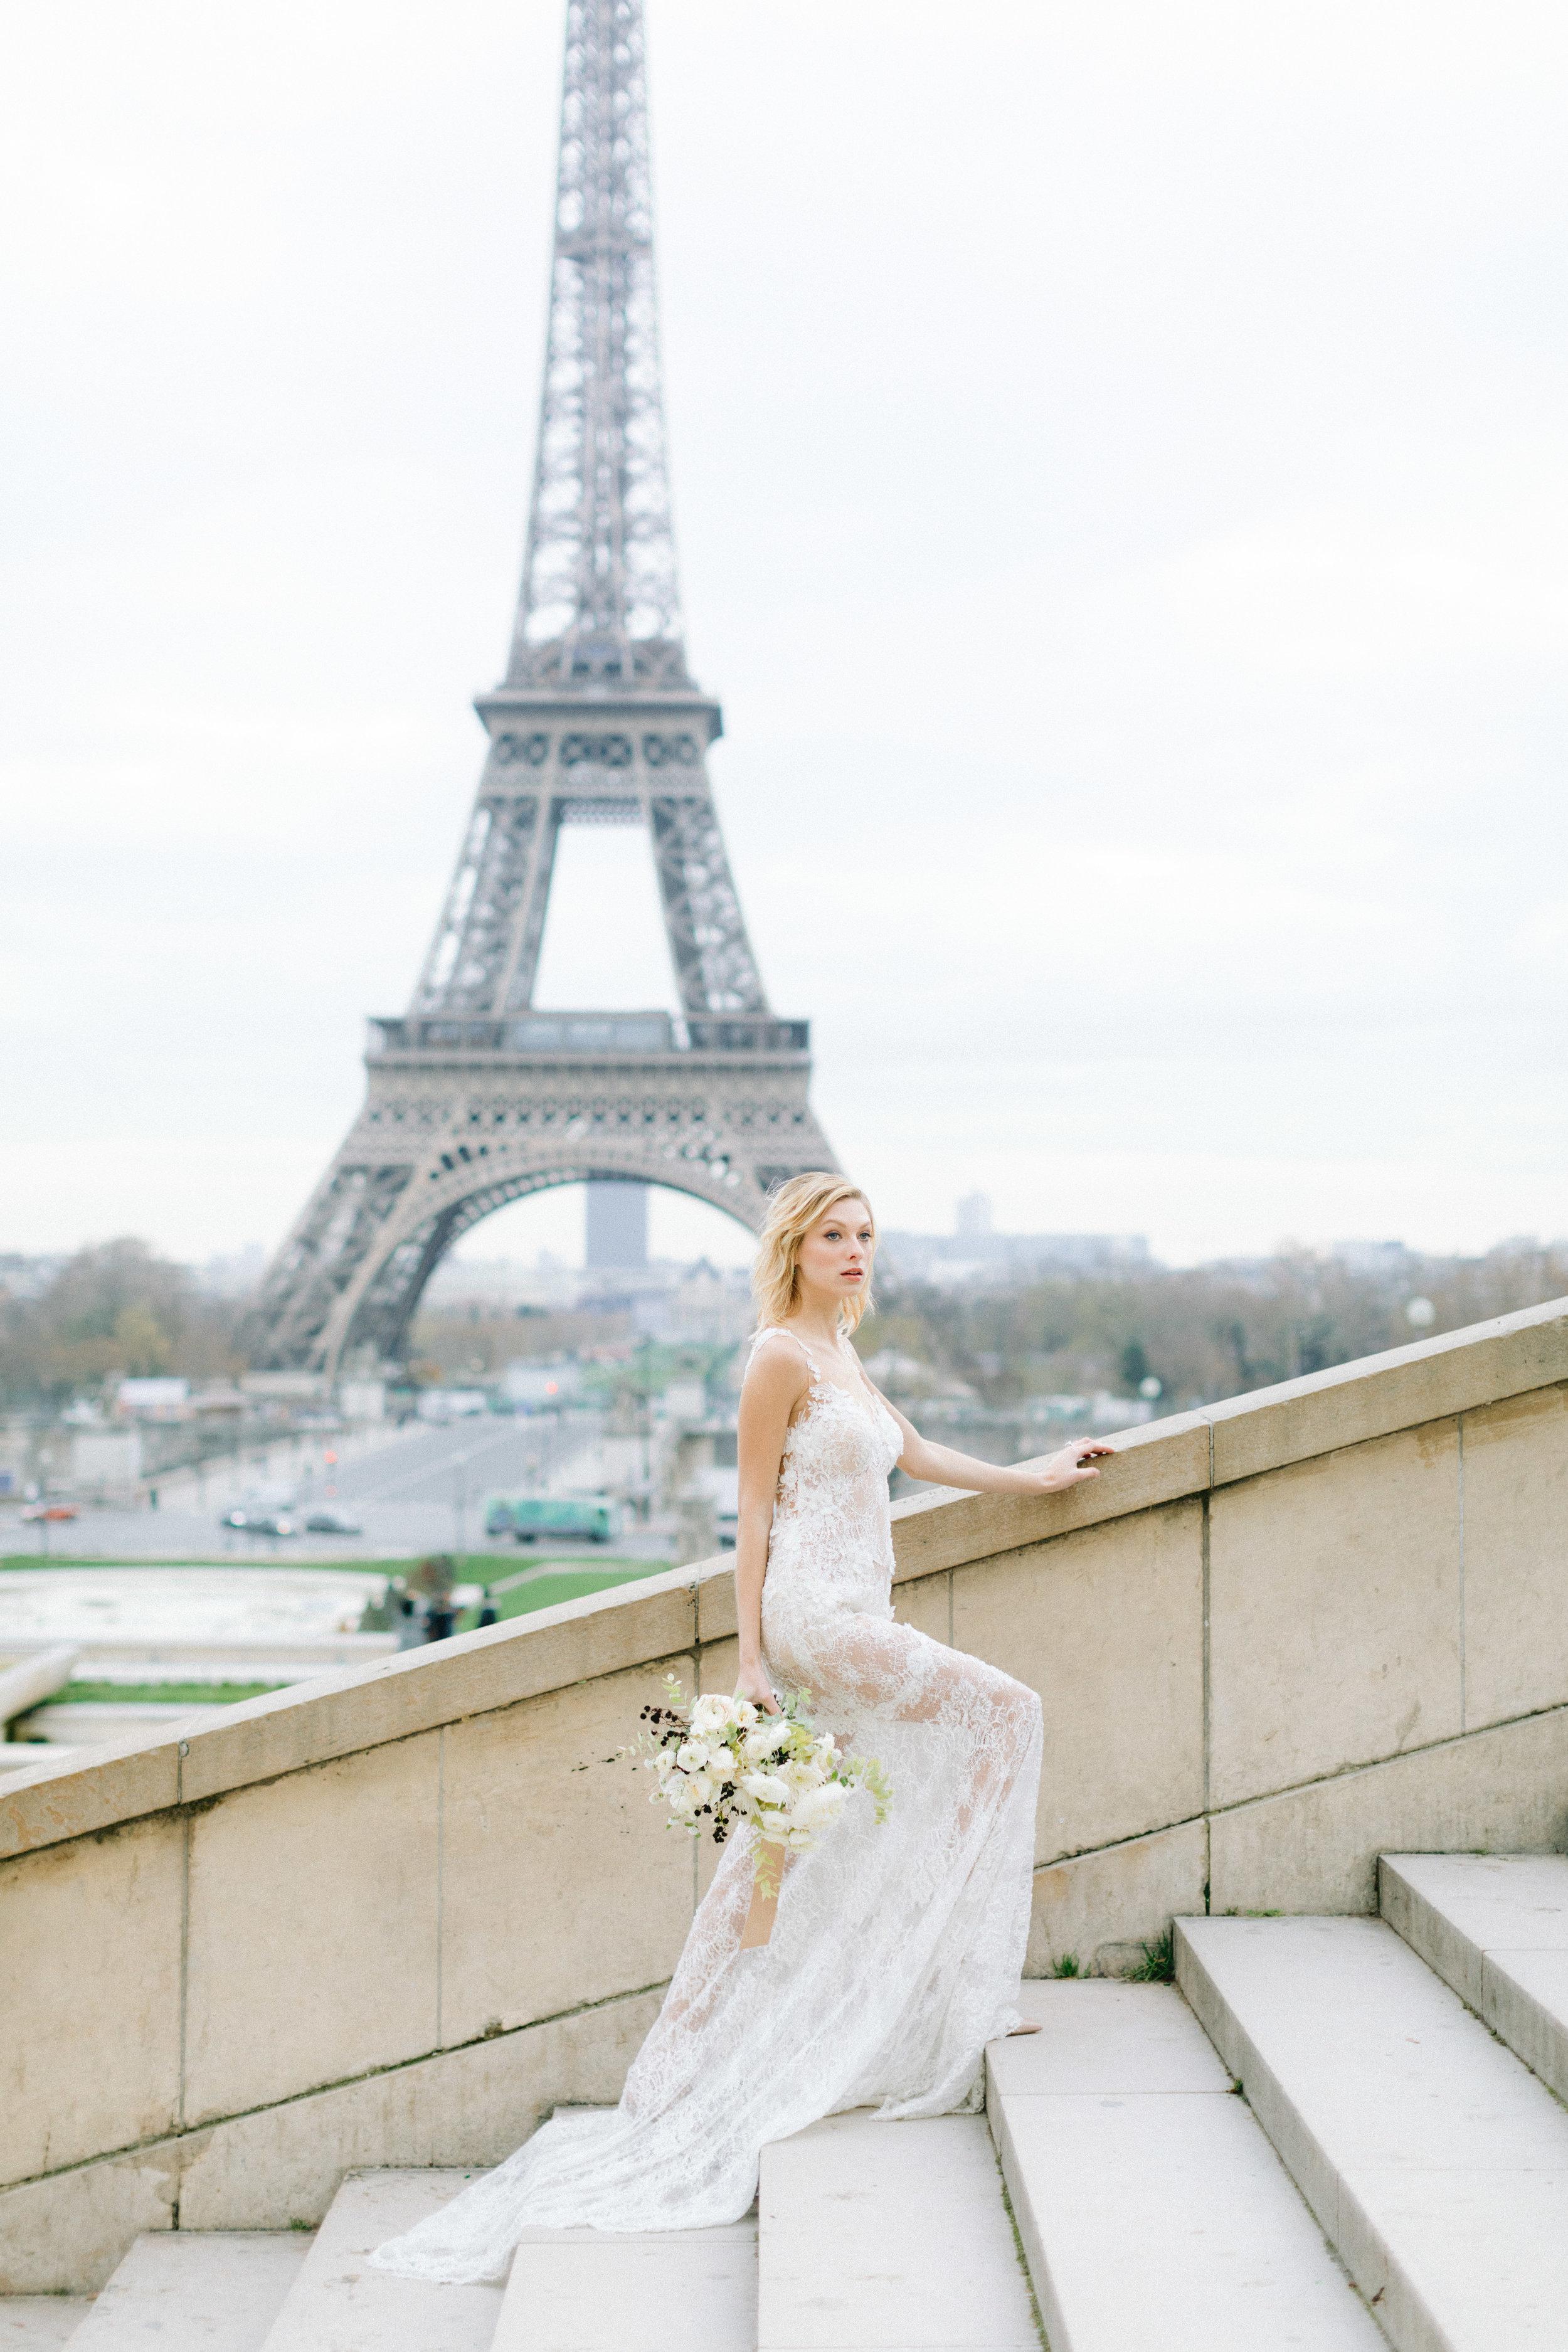 JennyQuicksallPhotography_www.jennyquicksall.com_ParisFranceEditorial_-214.jpg